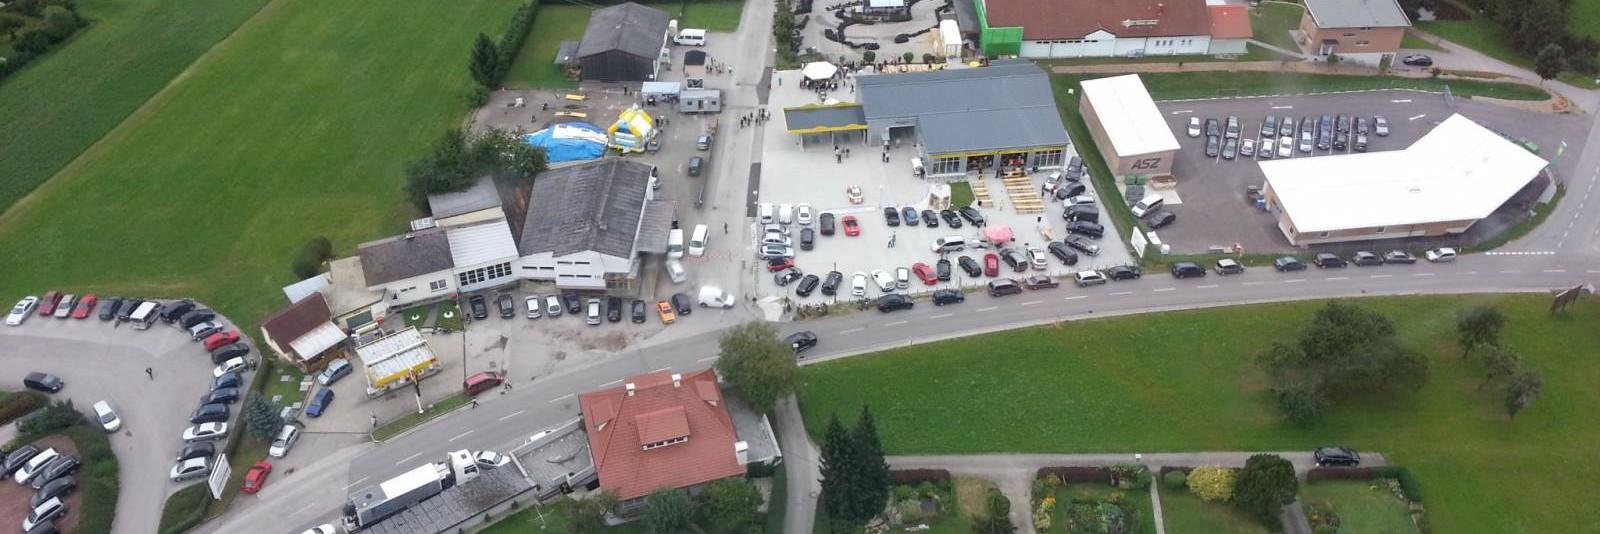 Hofkirchen Luftaufnahme